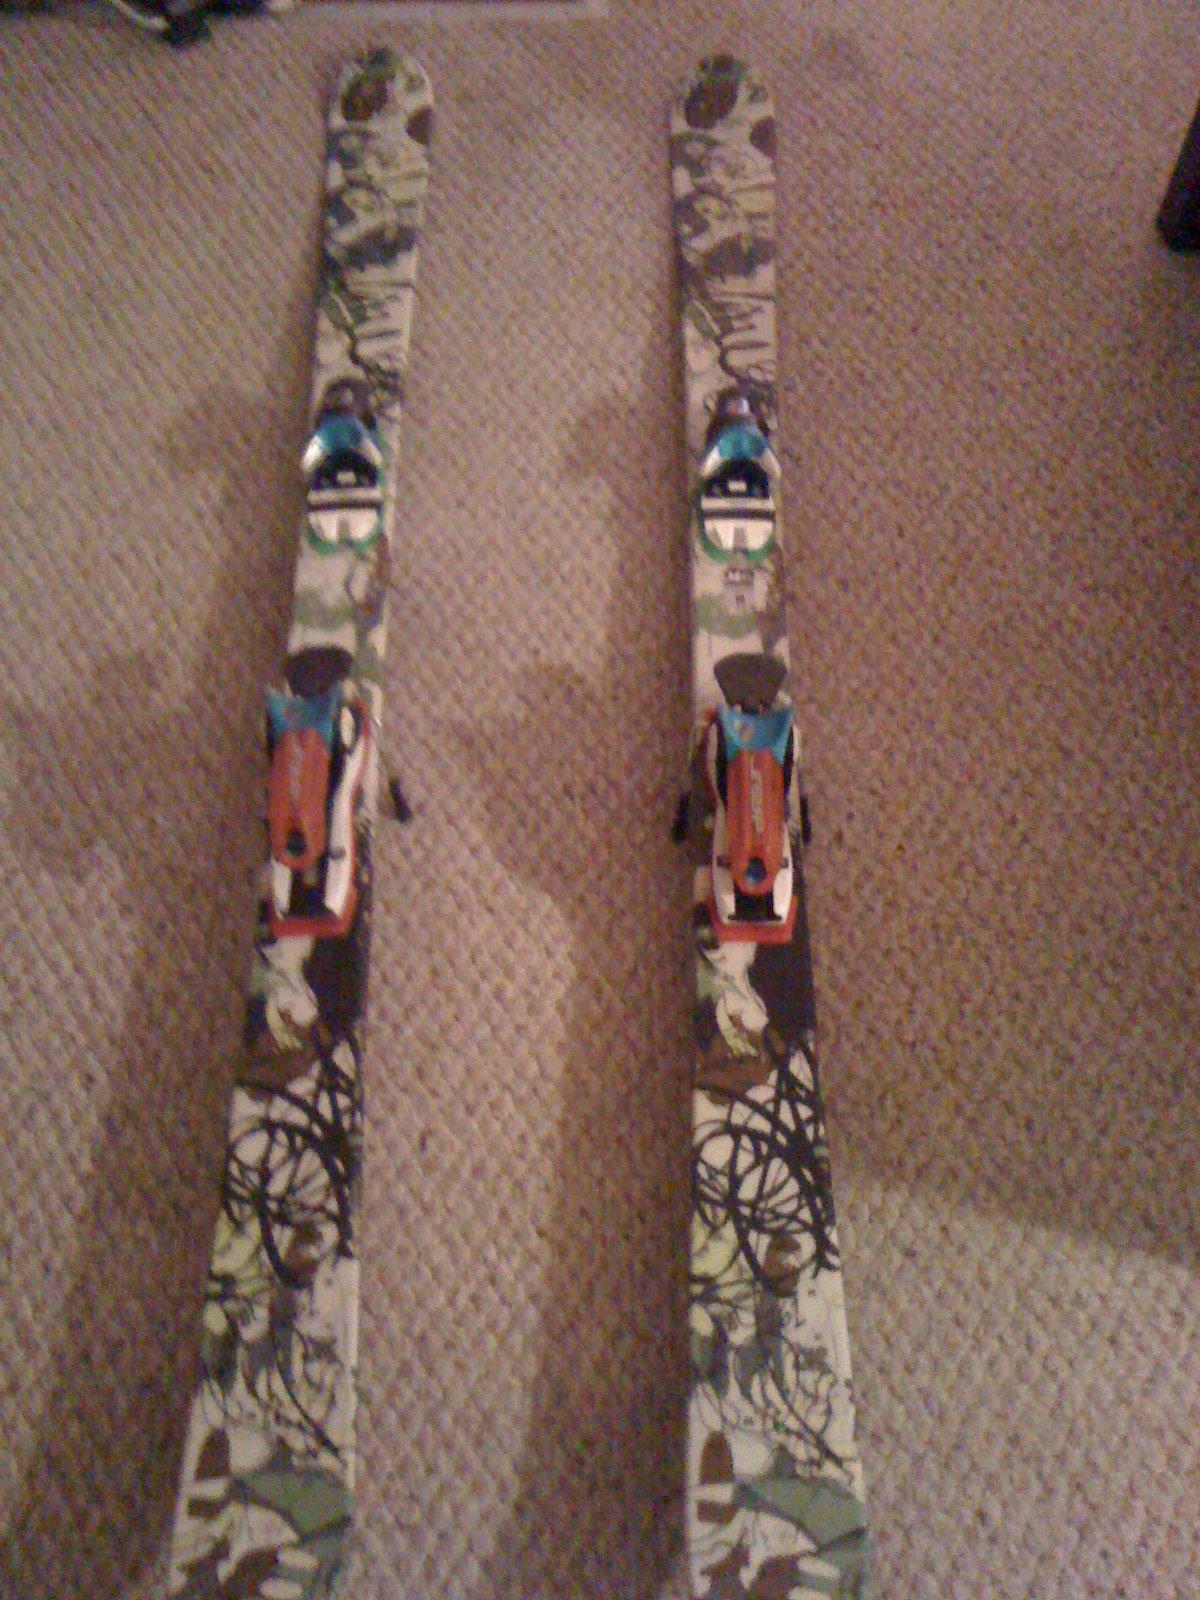 My sticks